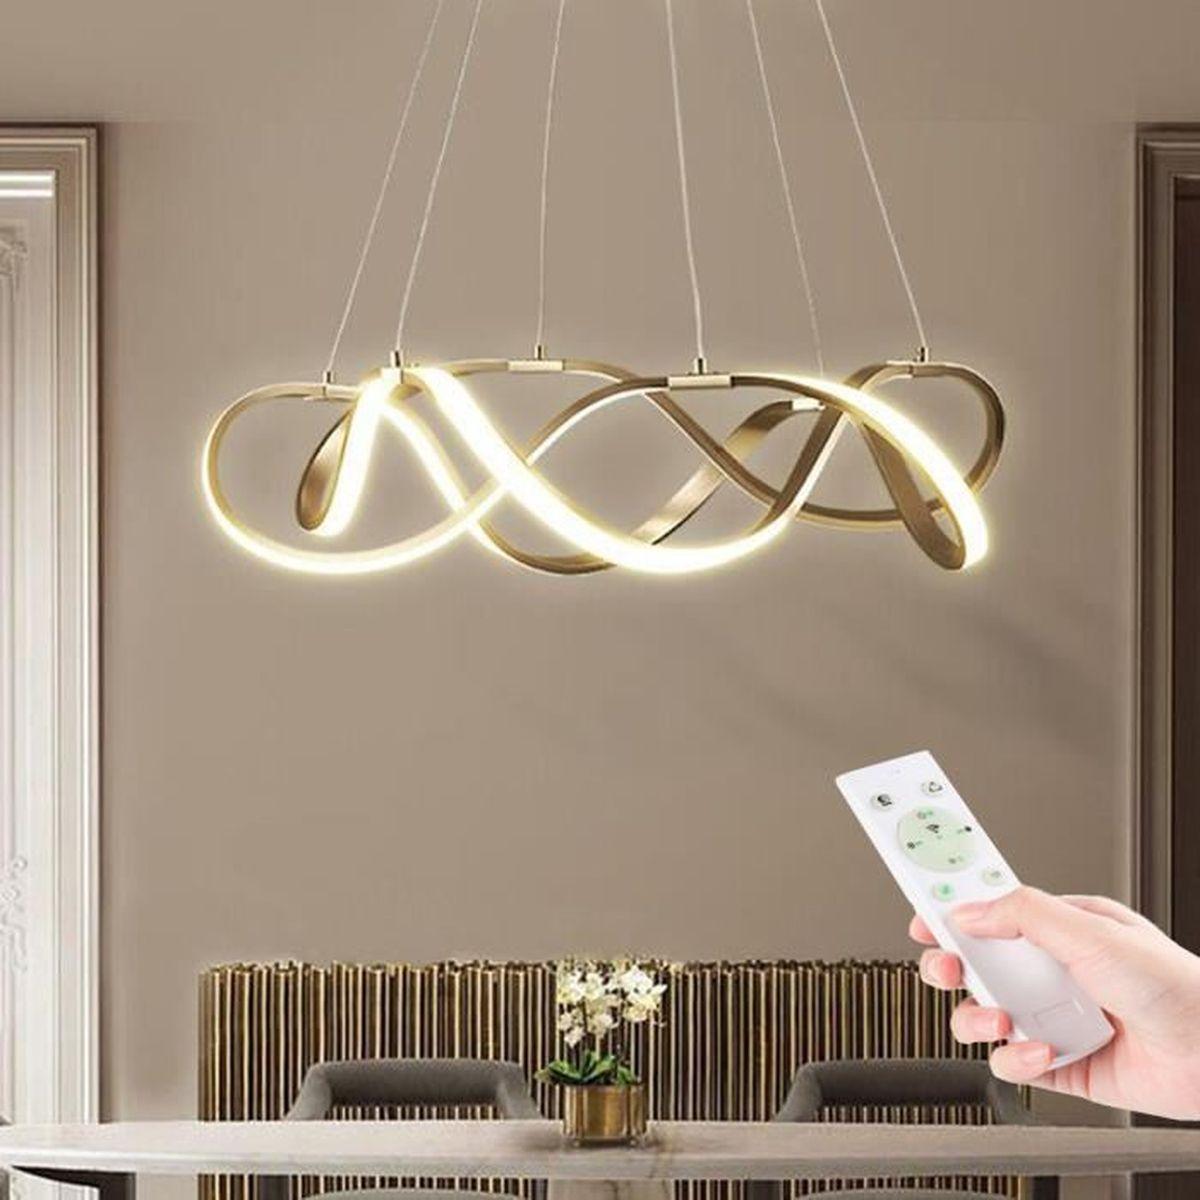 Lampe Plafond Salon Design plafonnier spirale